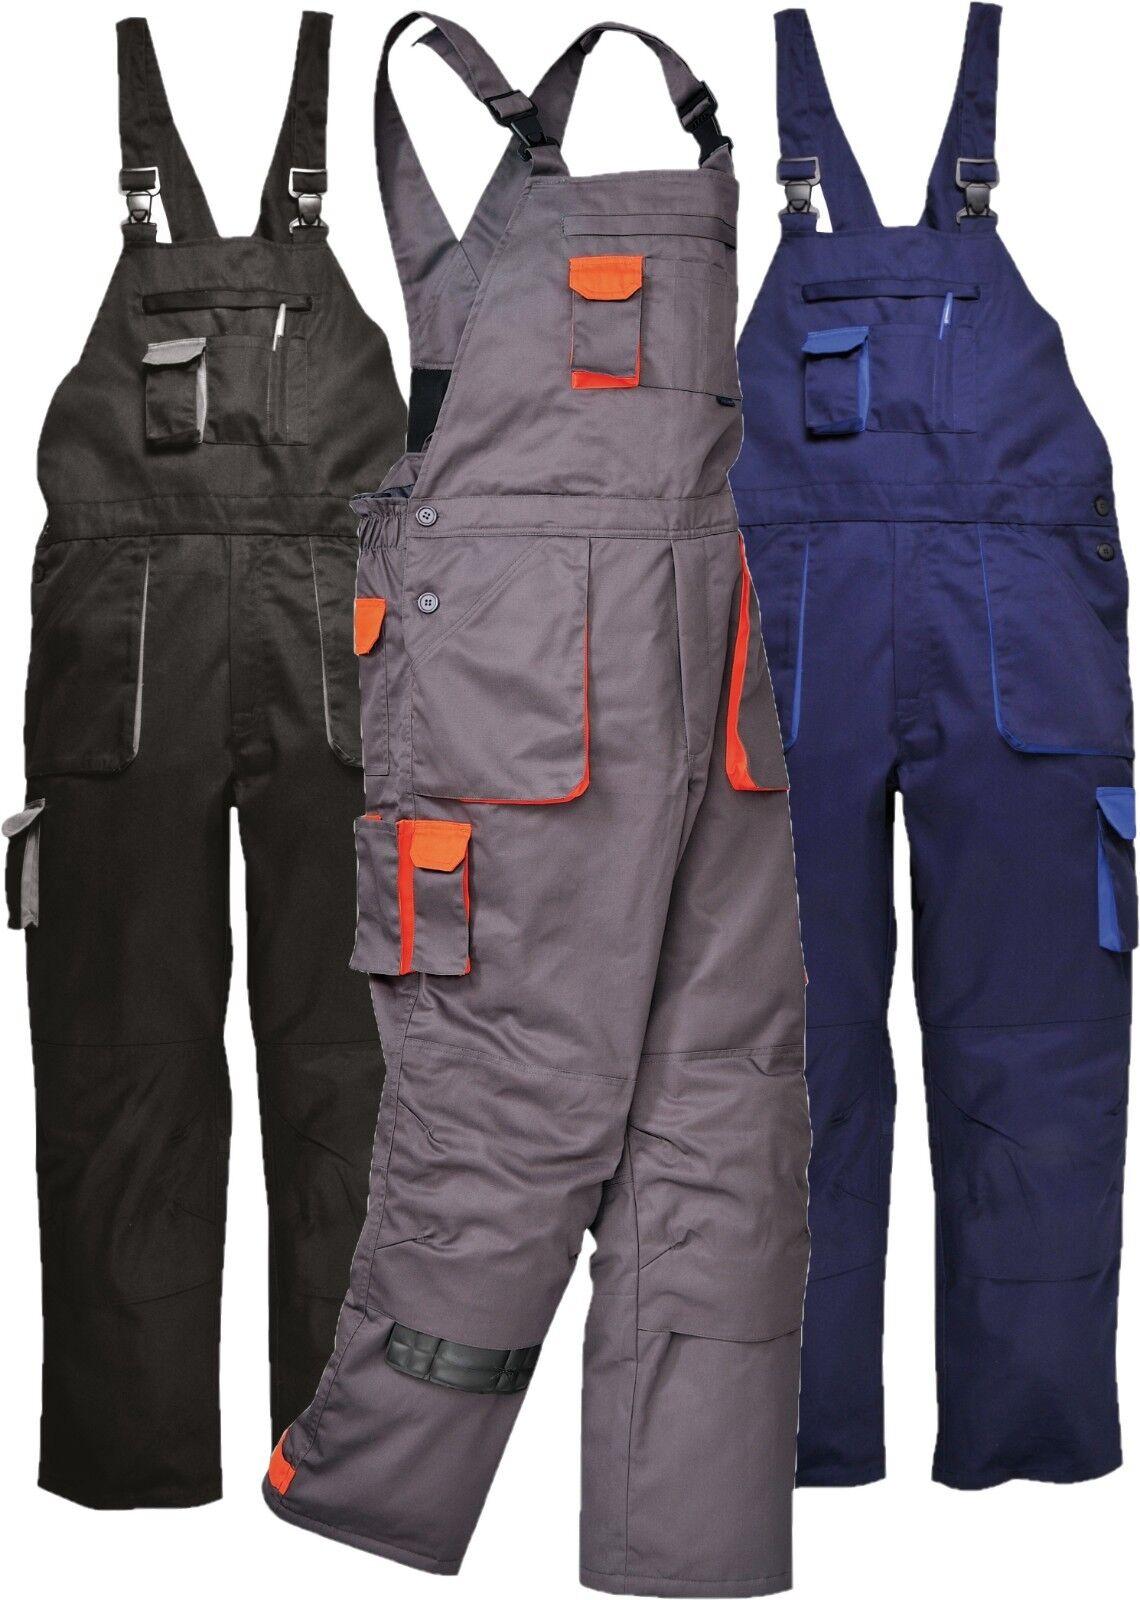 Portwest TX17 Bib /& Brace Warm Lined Texo Contrast Painters Work Wear Dungaree